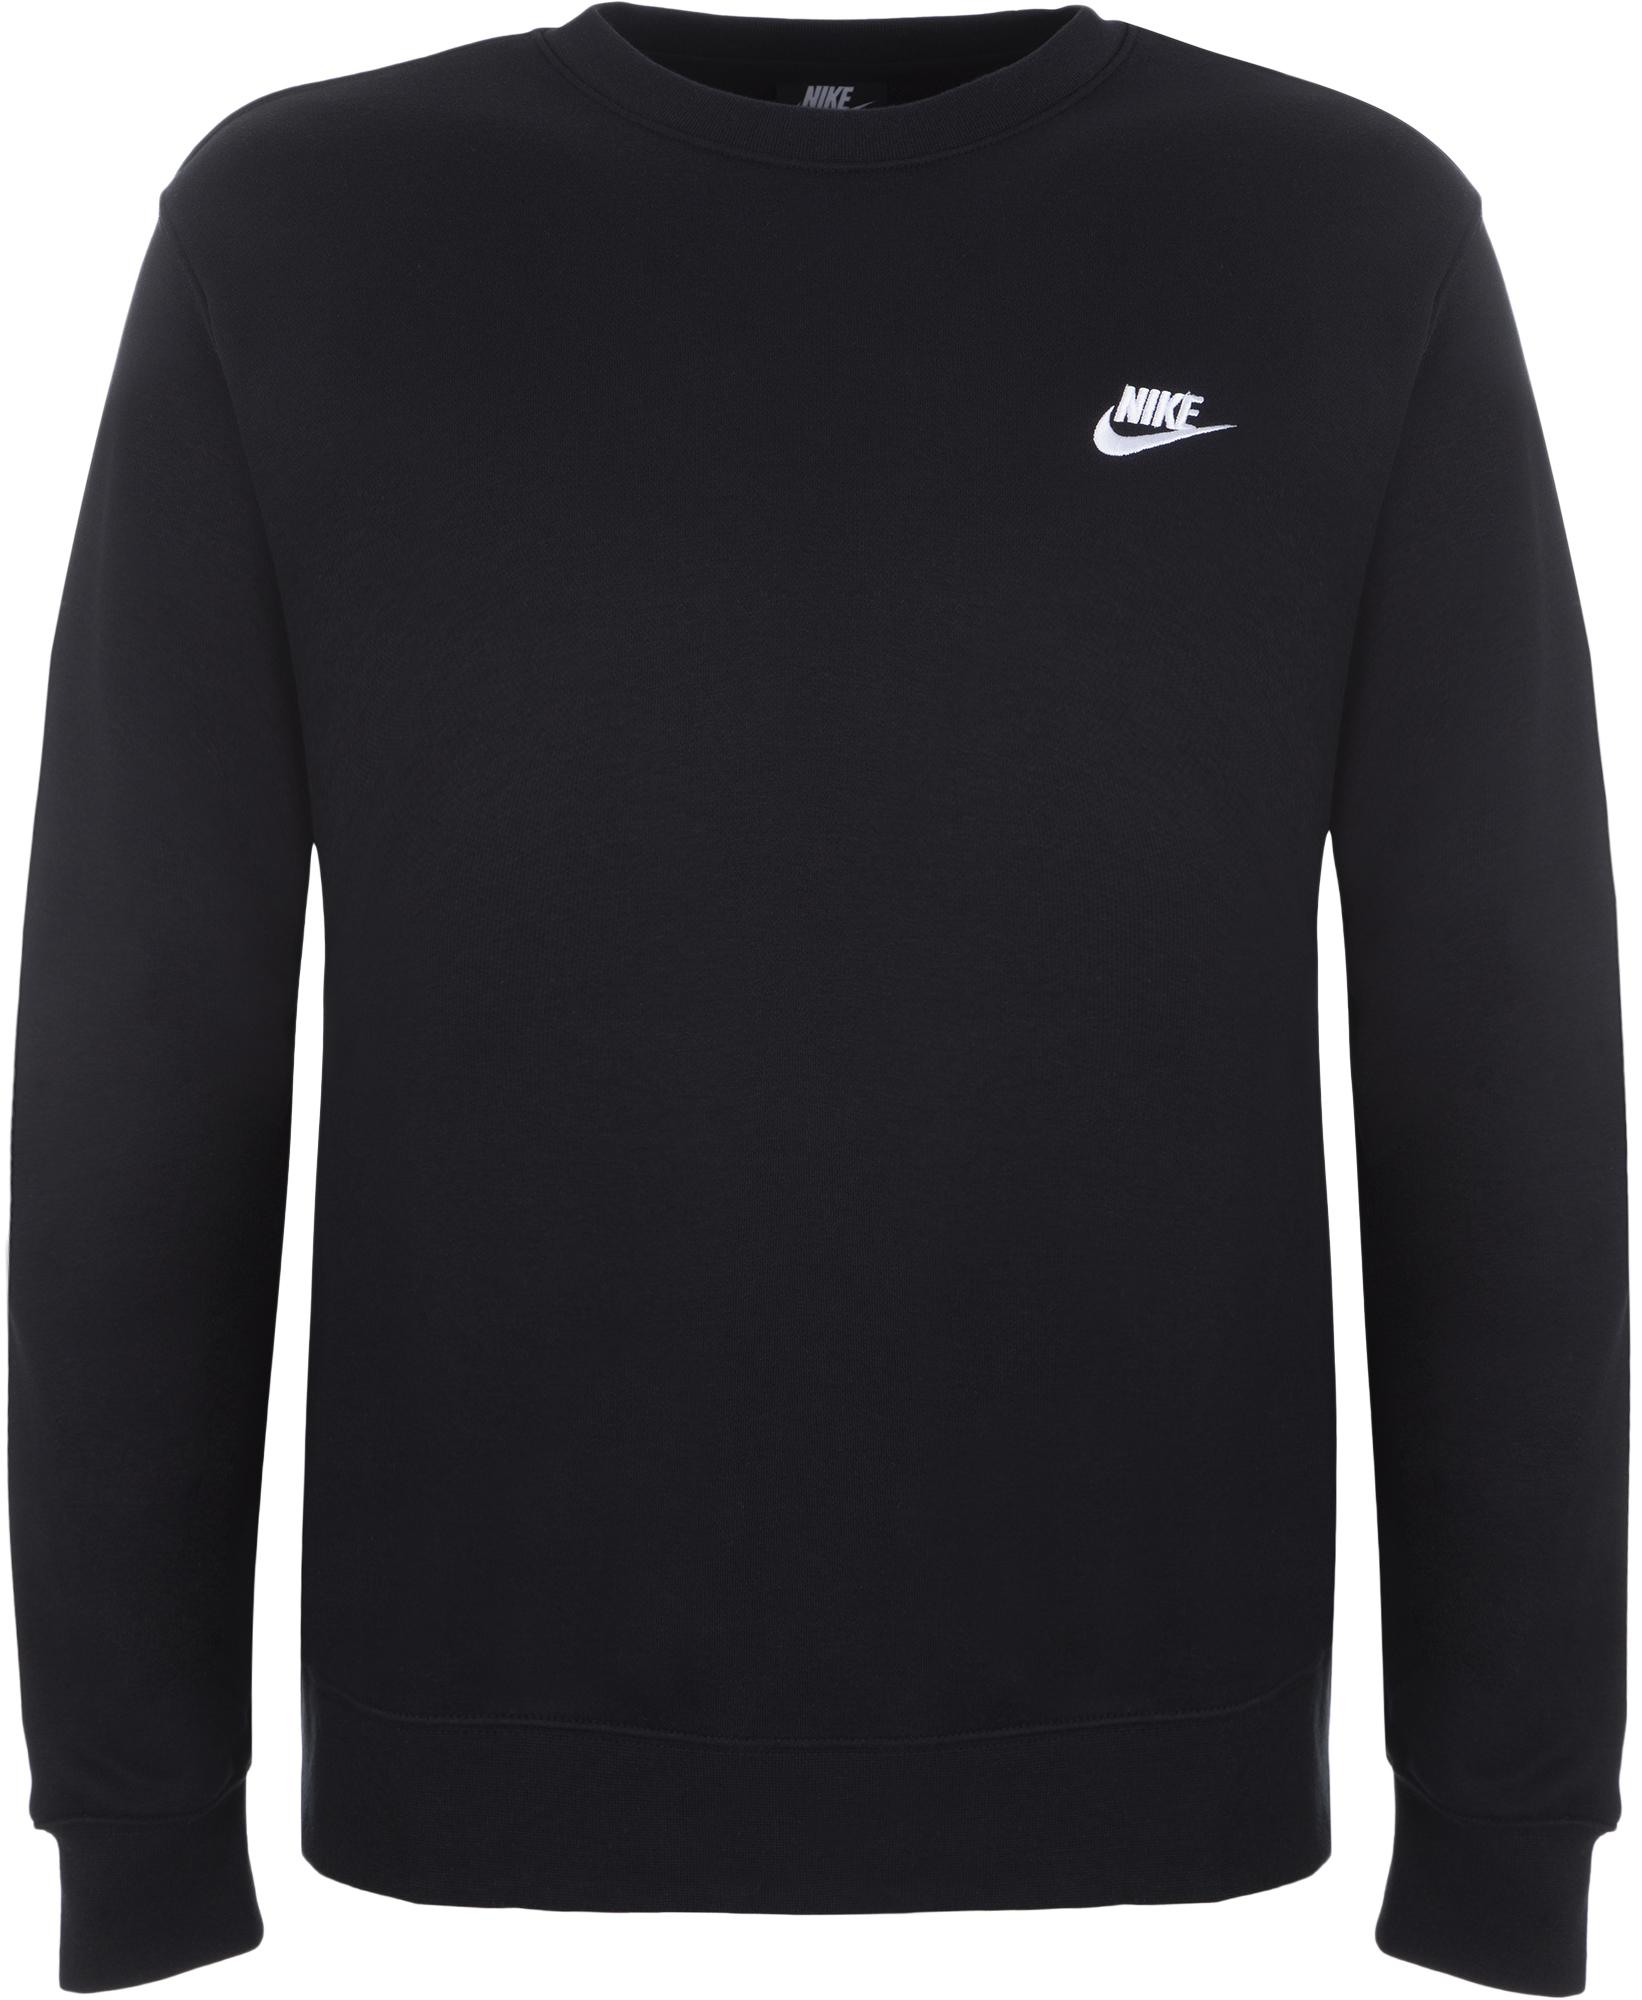 Nike Свитшот мужской Nike Club Crew, размер 52-54 цена и фото